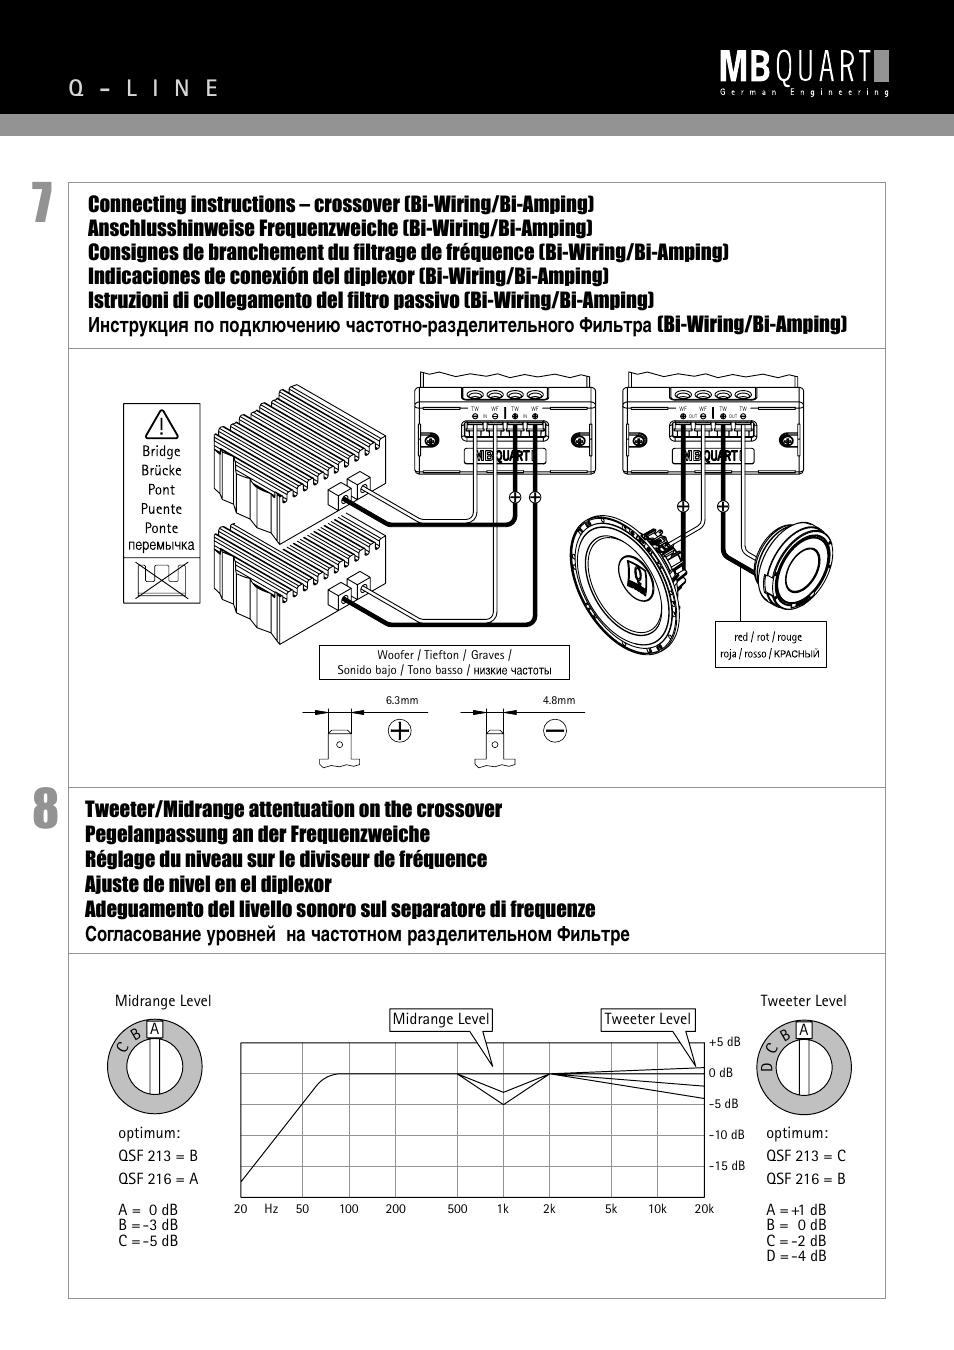 q l i n e mb quart qsf 216 nano user manual page 2 9 rh manualsdir com mb quart subwoofer wiring diagram mb quart crossover wiring diagram